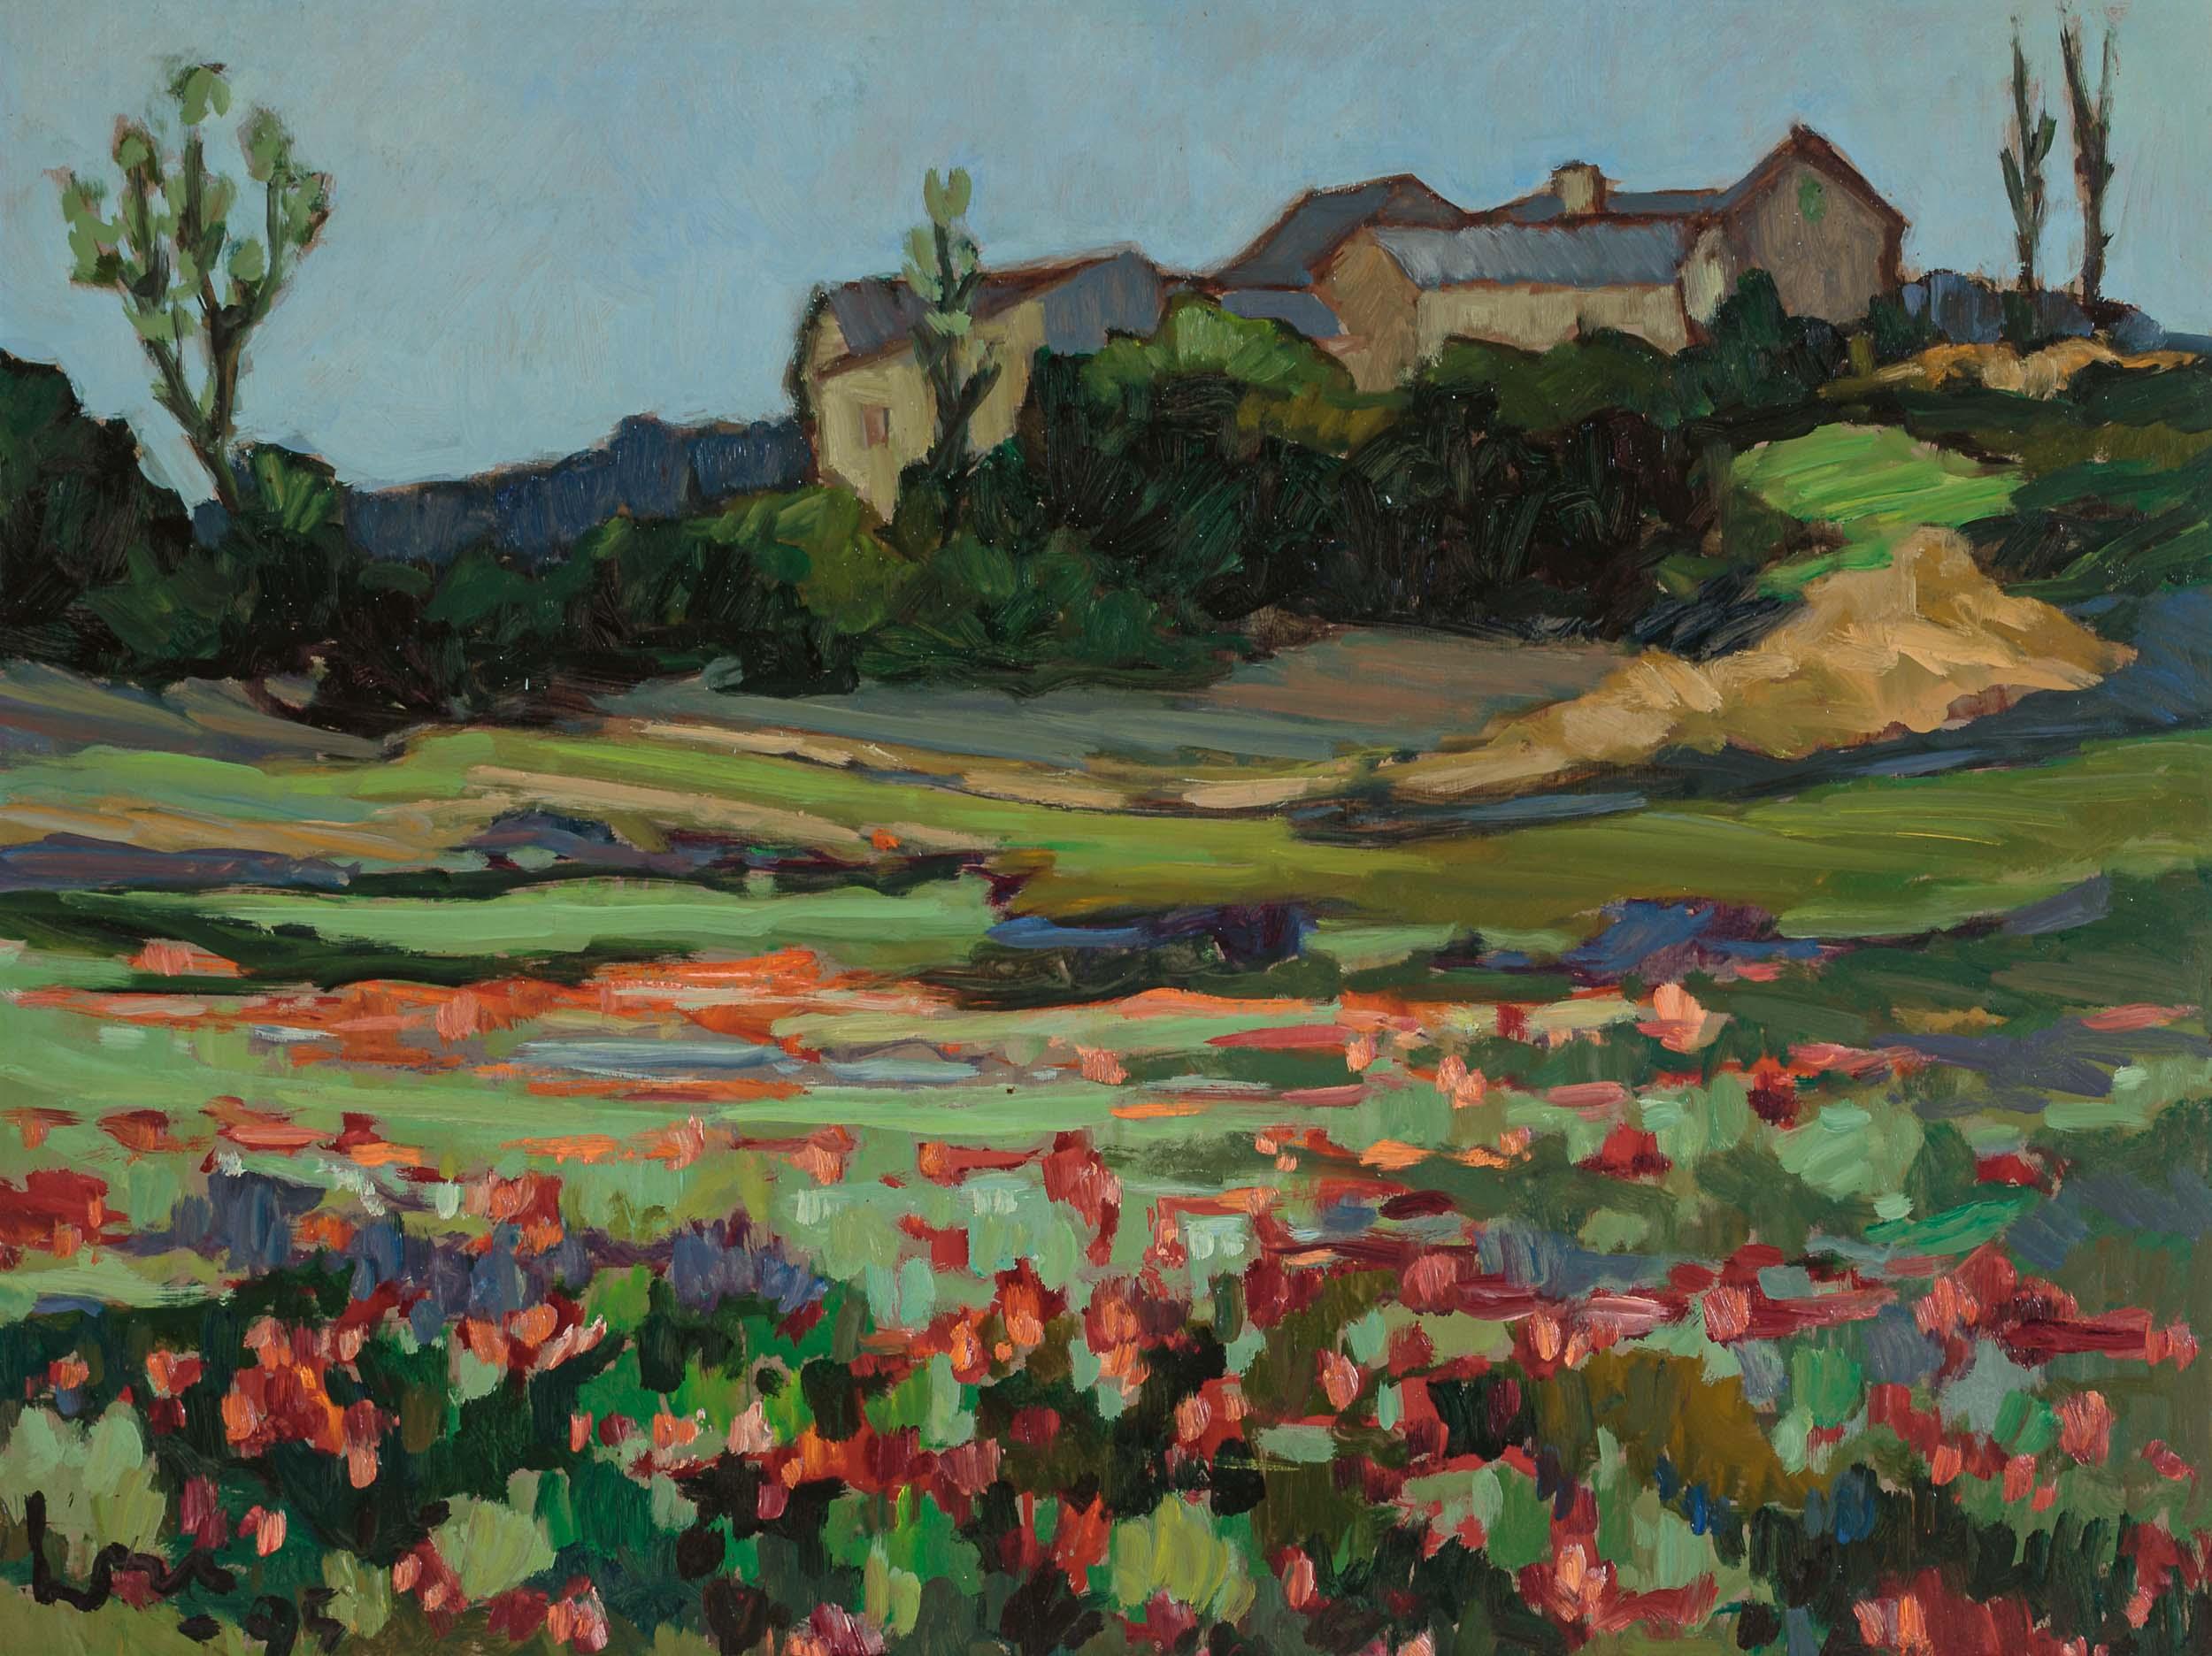 'Klaprozenveld in Rouveret' (Poppy field in Rouveret)